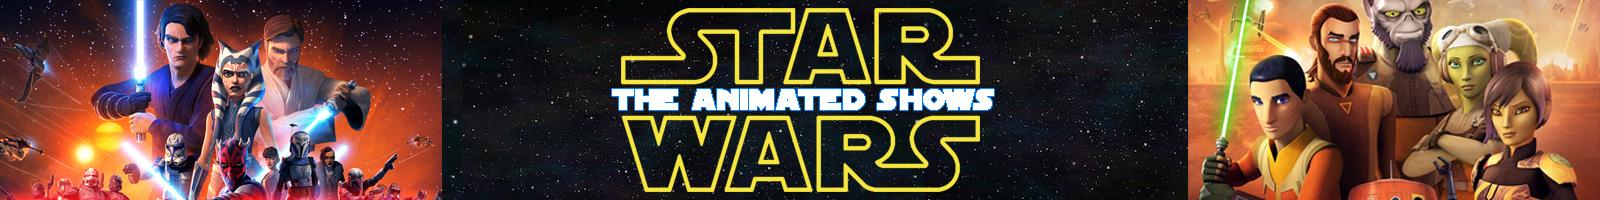 SW A Shows